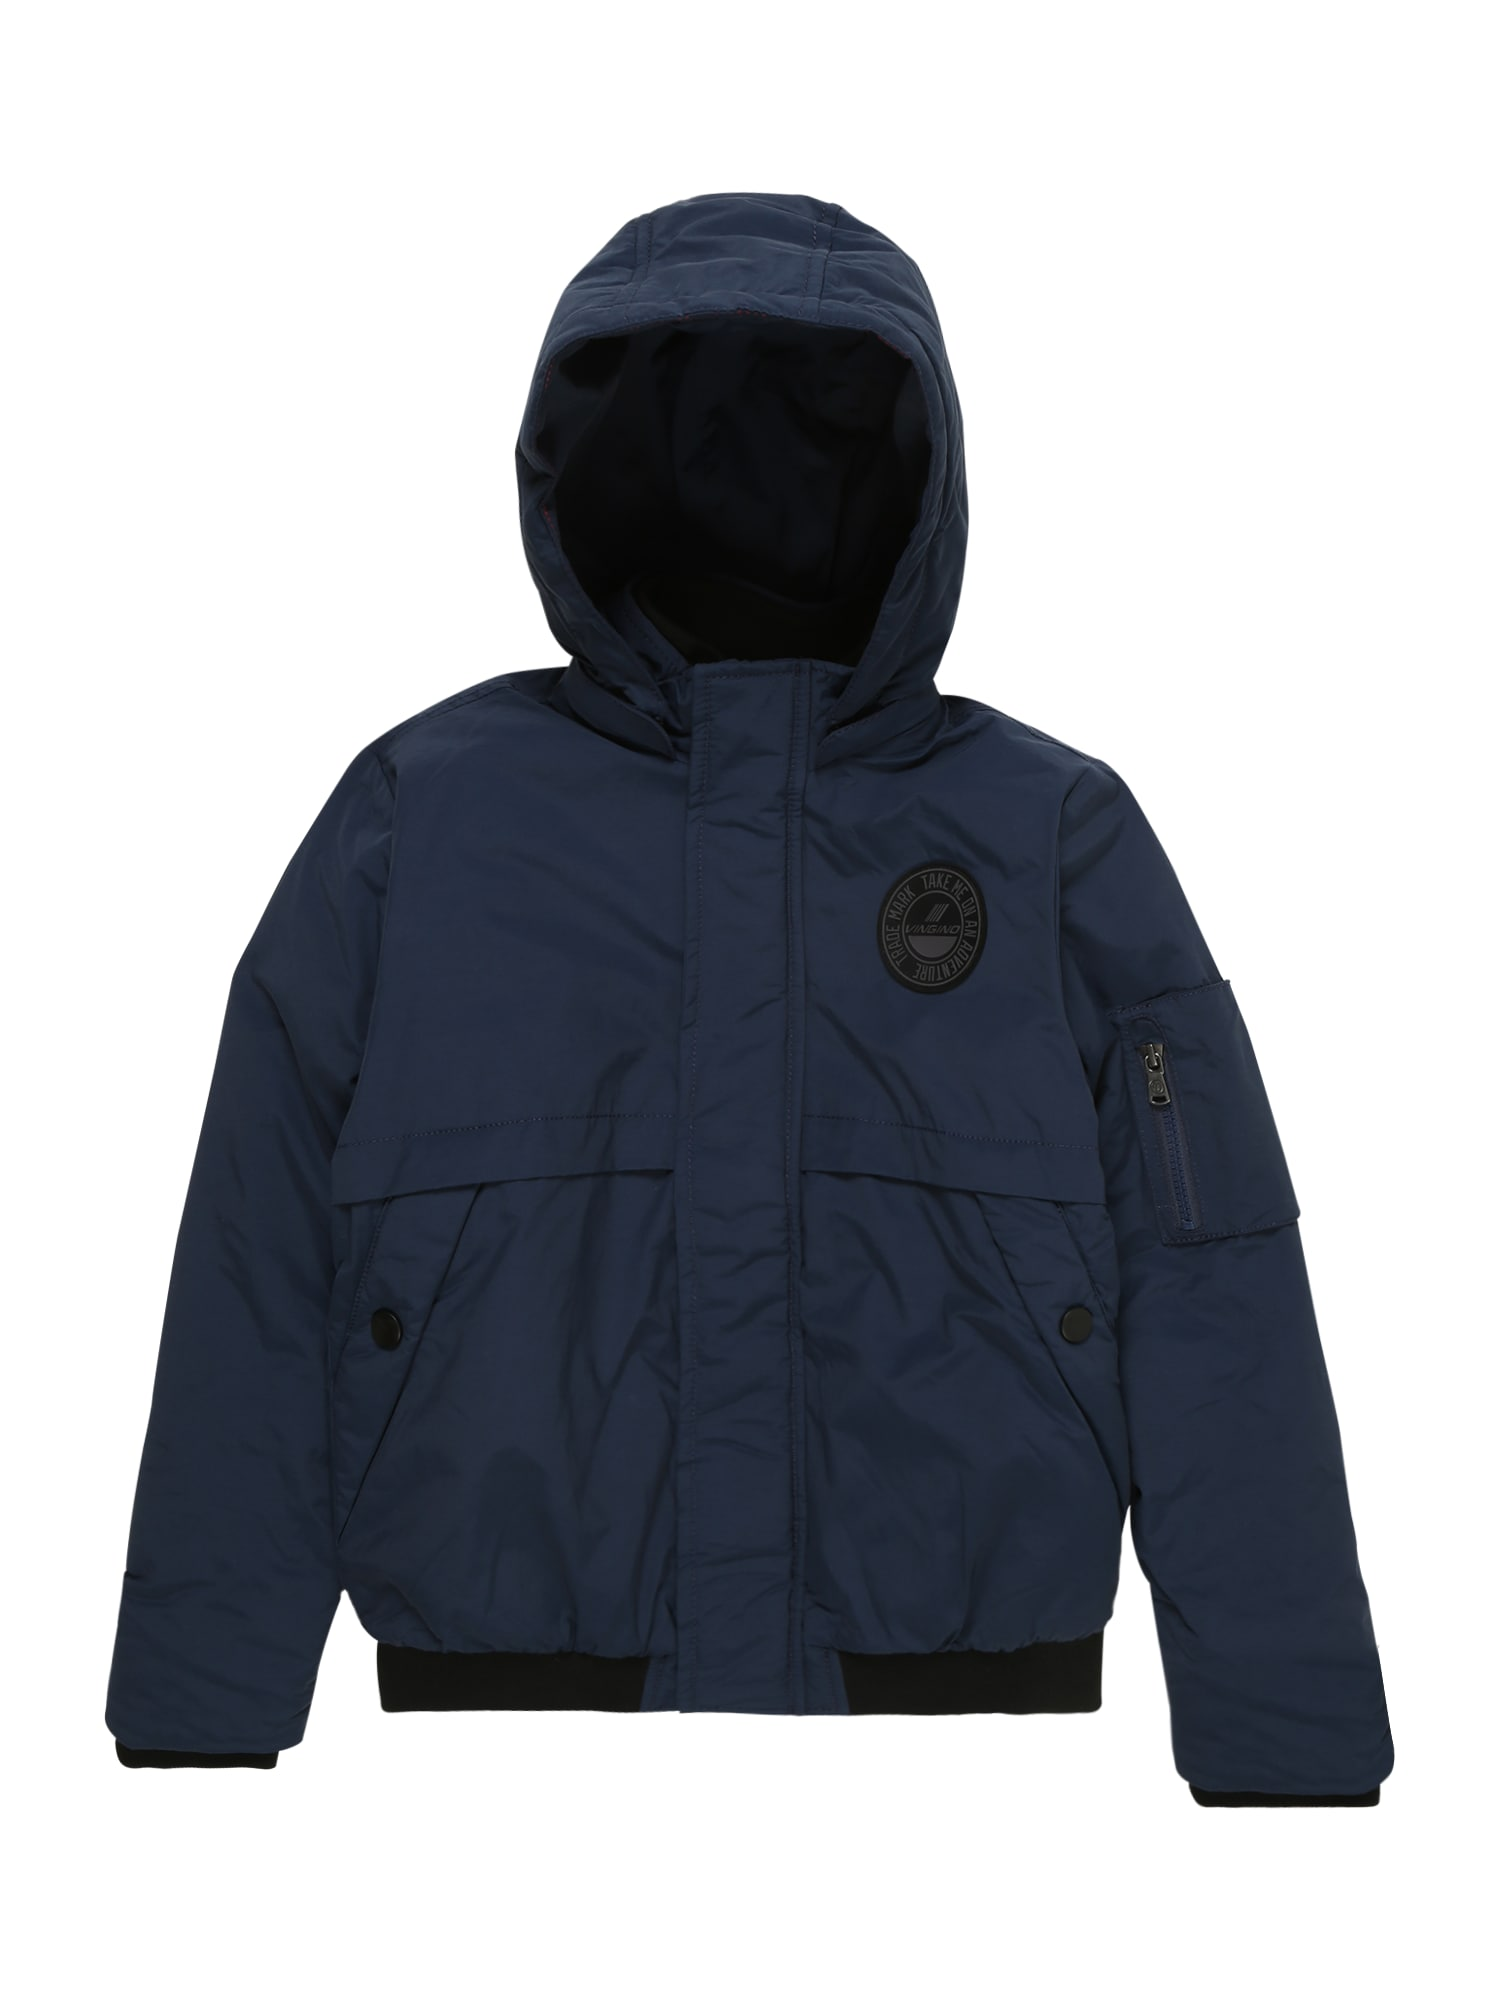 Přechodná bunda Theigo tmavě modrá VINGINO